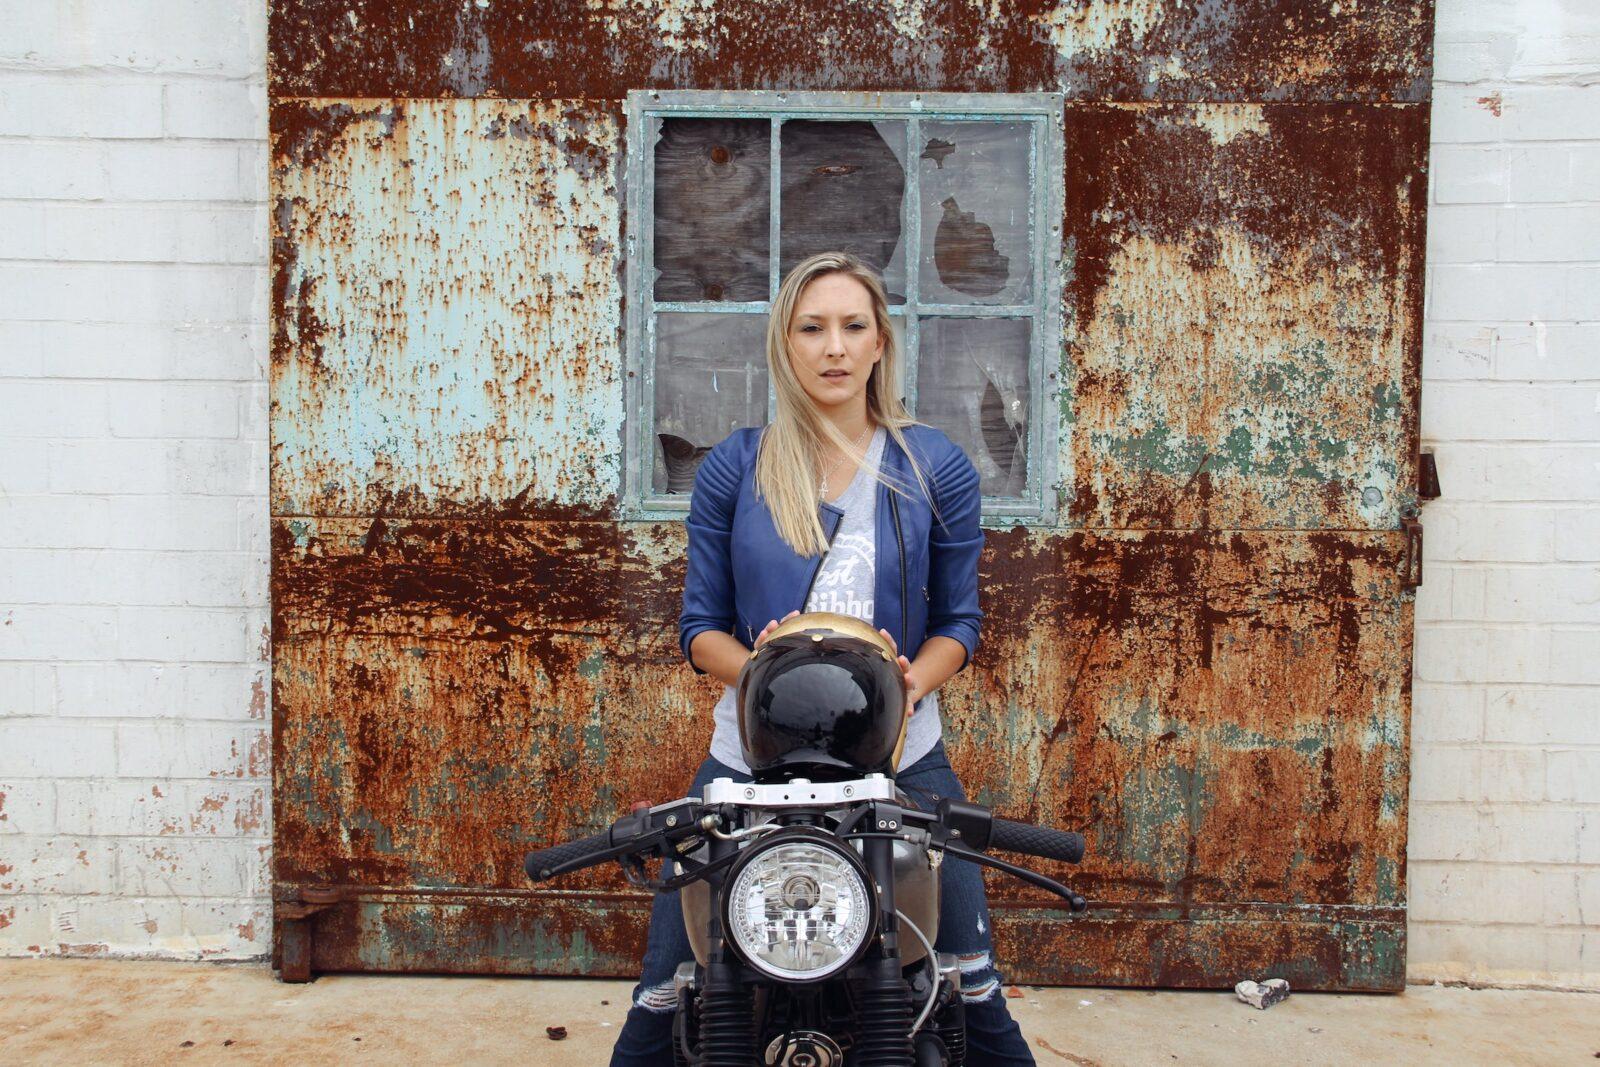 Honda CB550 10 1600x1067 - Jennifer Bailey's Honda CB550